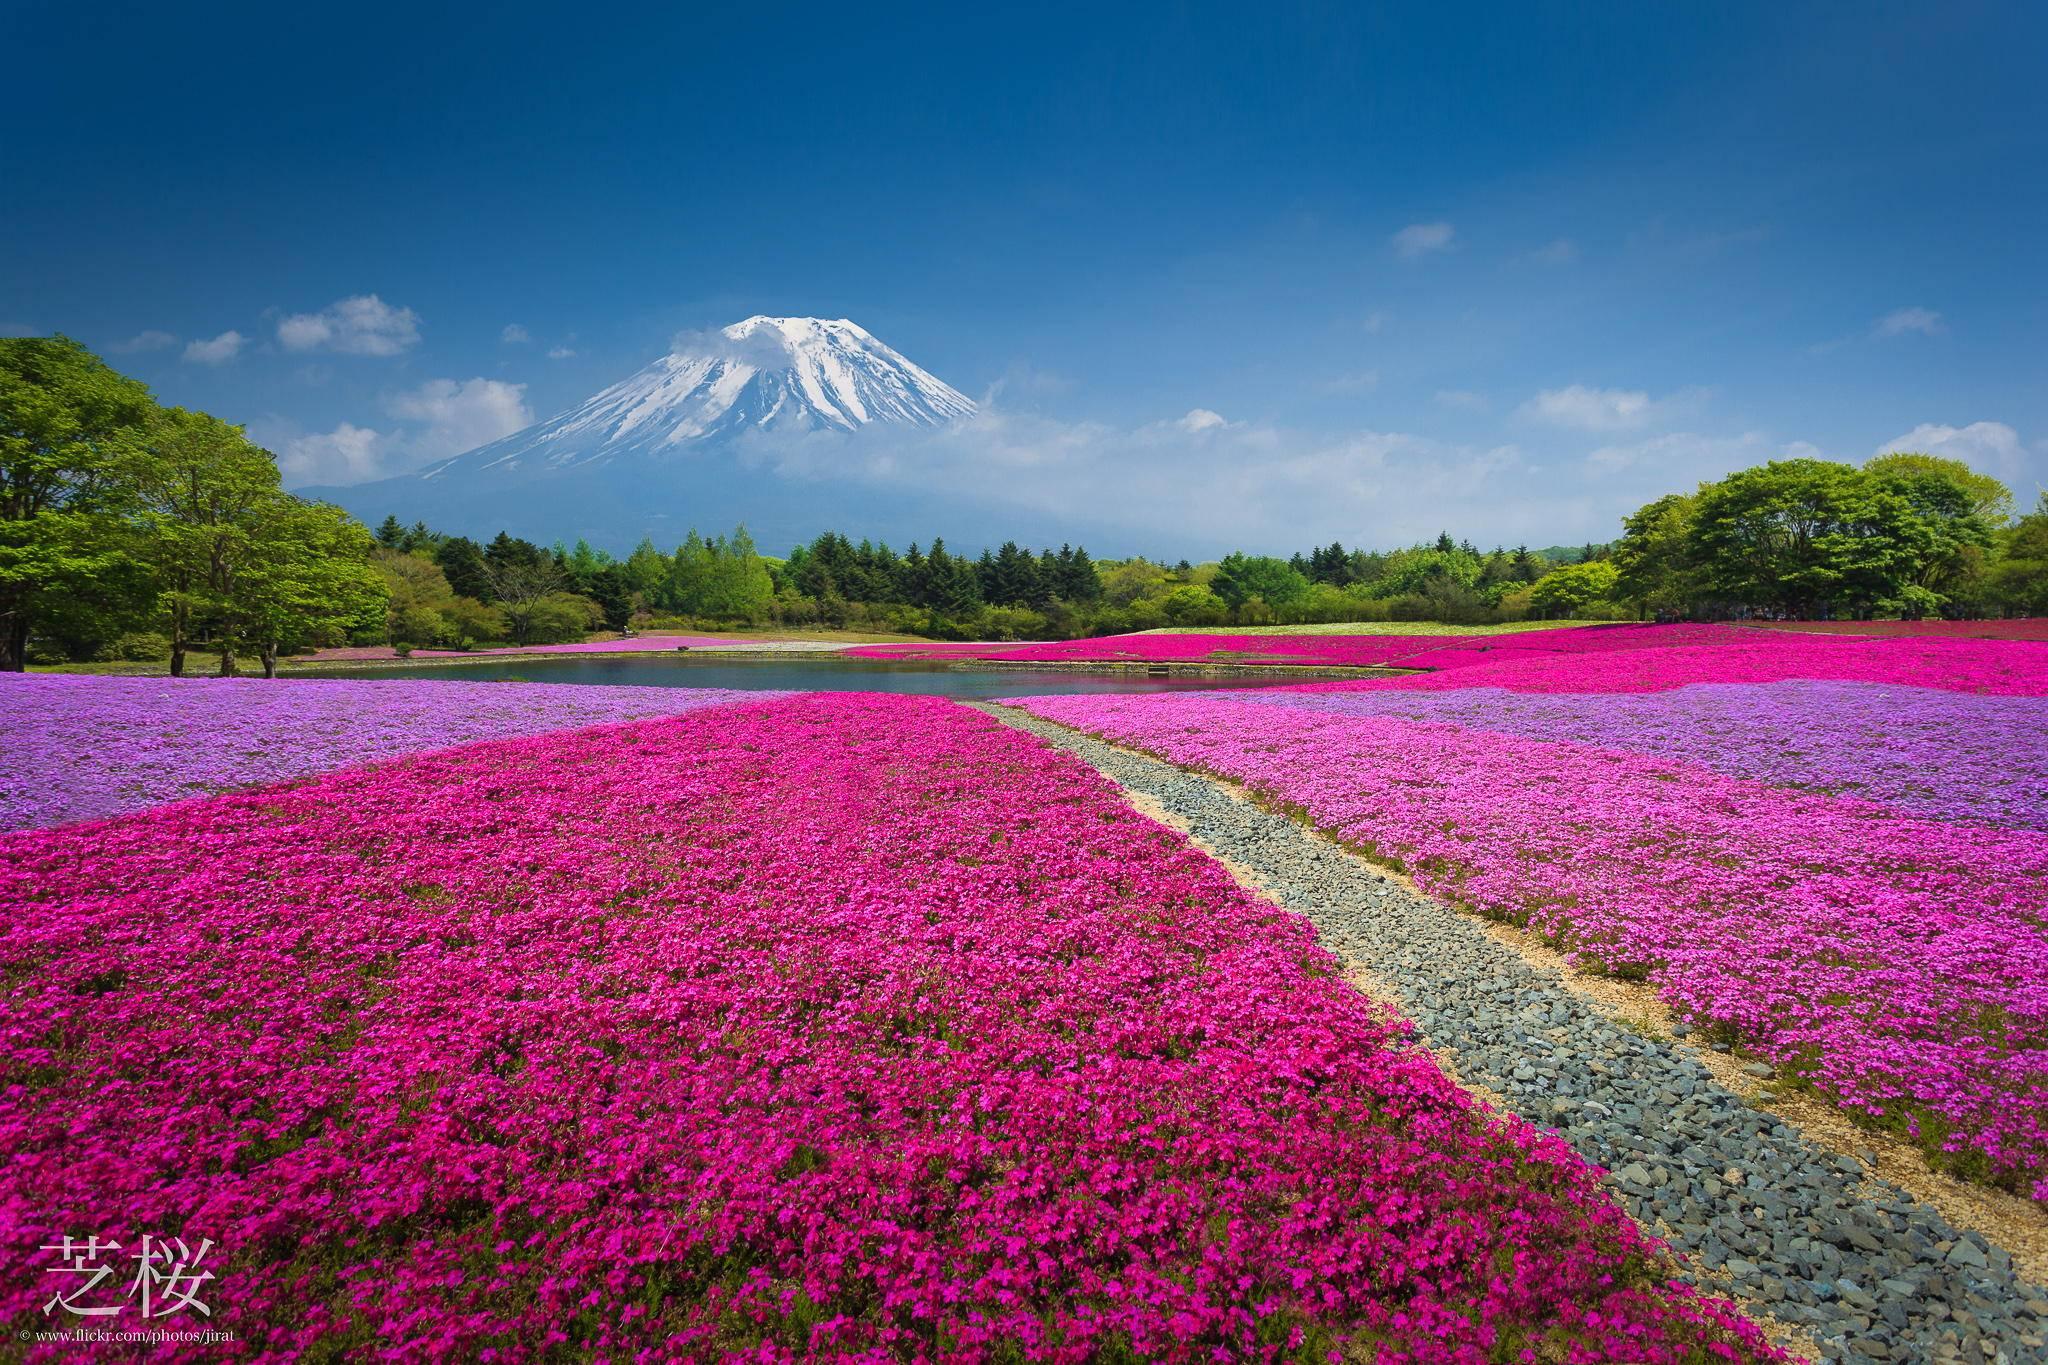 Mt Fuji Beautiful Landscape In Japan 1349233 Hd Wallpaper Backgrounds Download